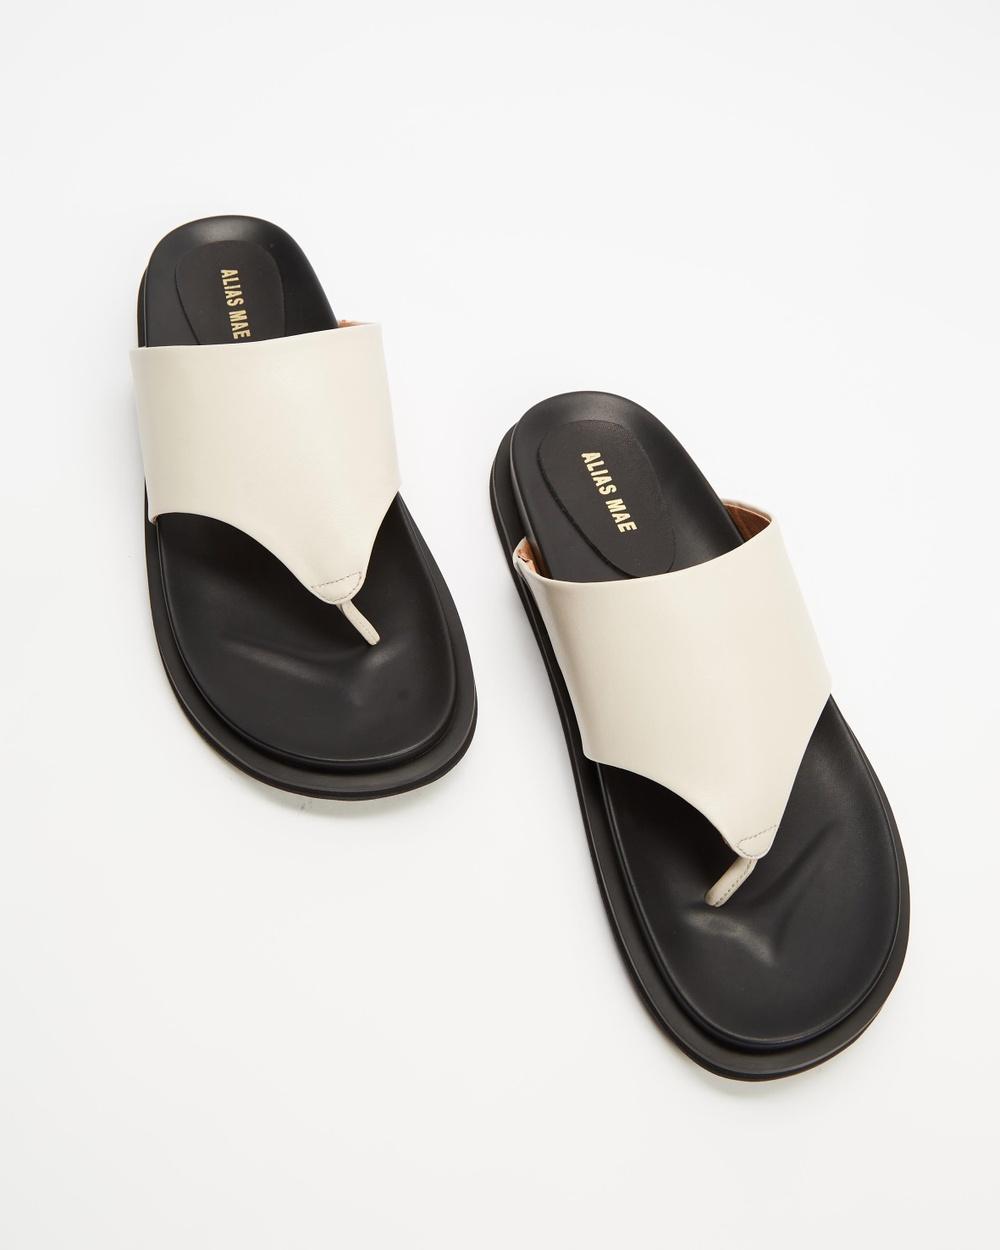 Alias Mae Sonda Sandals Bone Leather